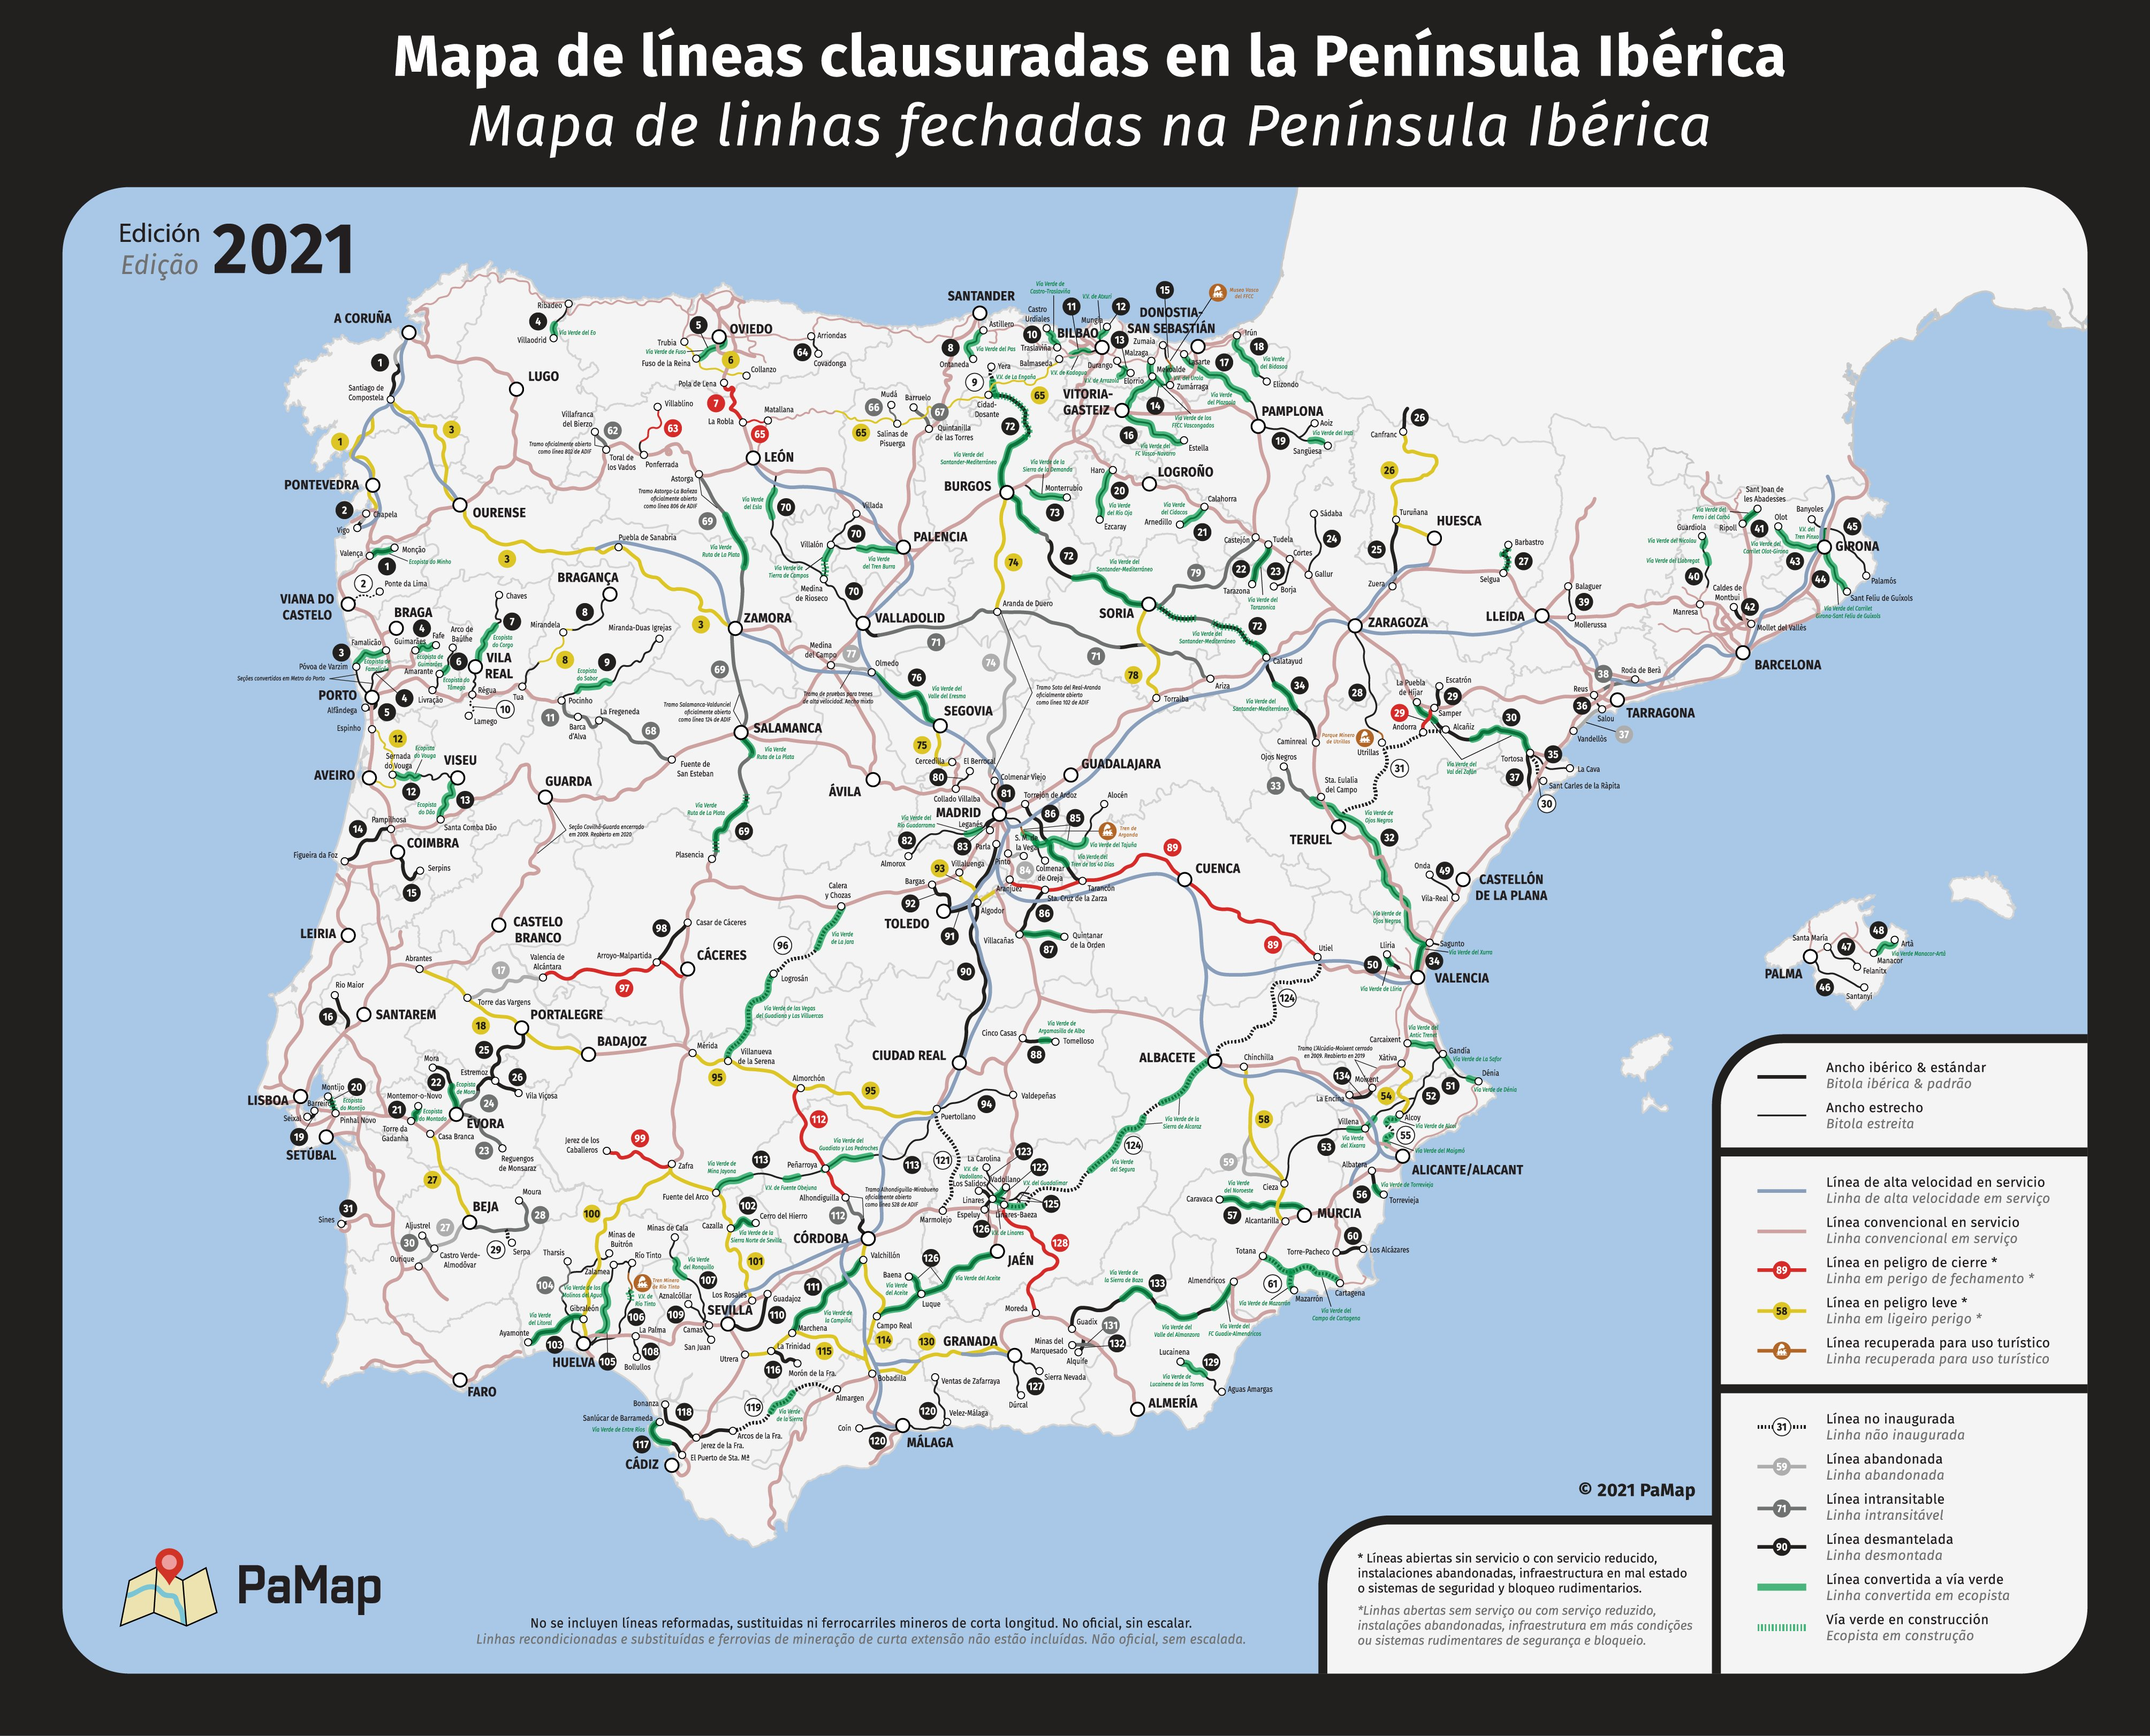 Transportes: Ferrocarril en España, alta velocidad, convencional. - Página 7 EuSwLh8XYAINYNn?format=jpg&name=4096x4096